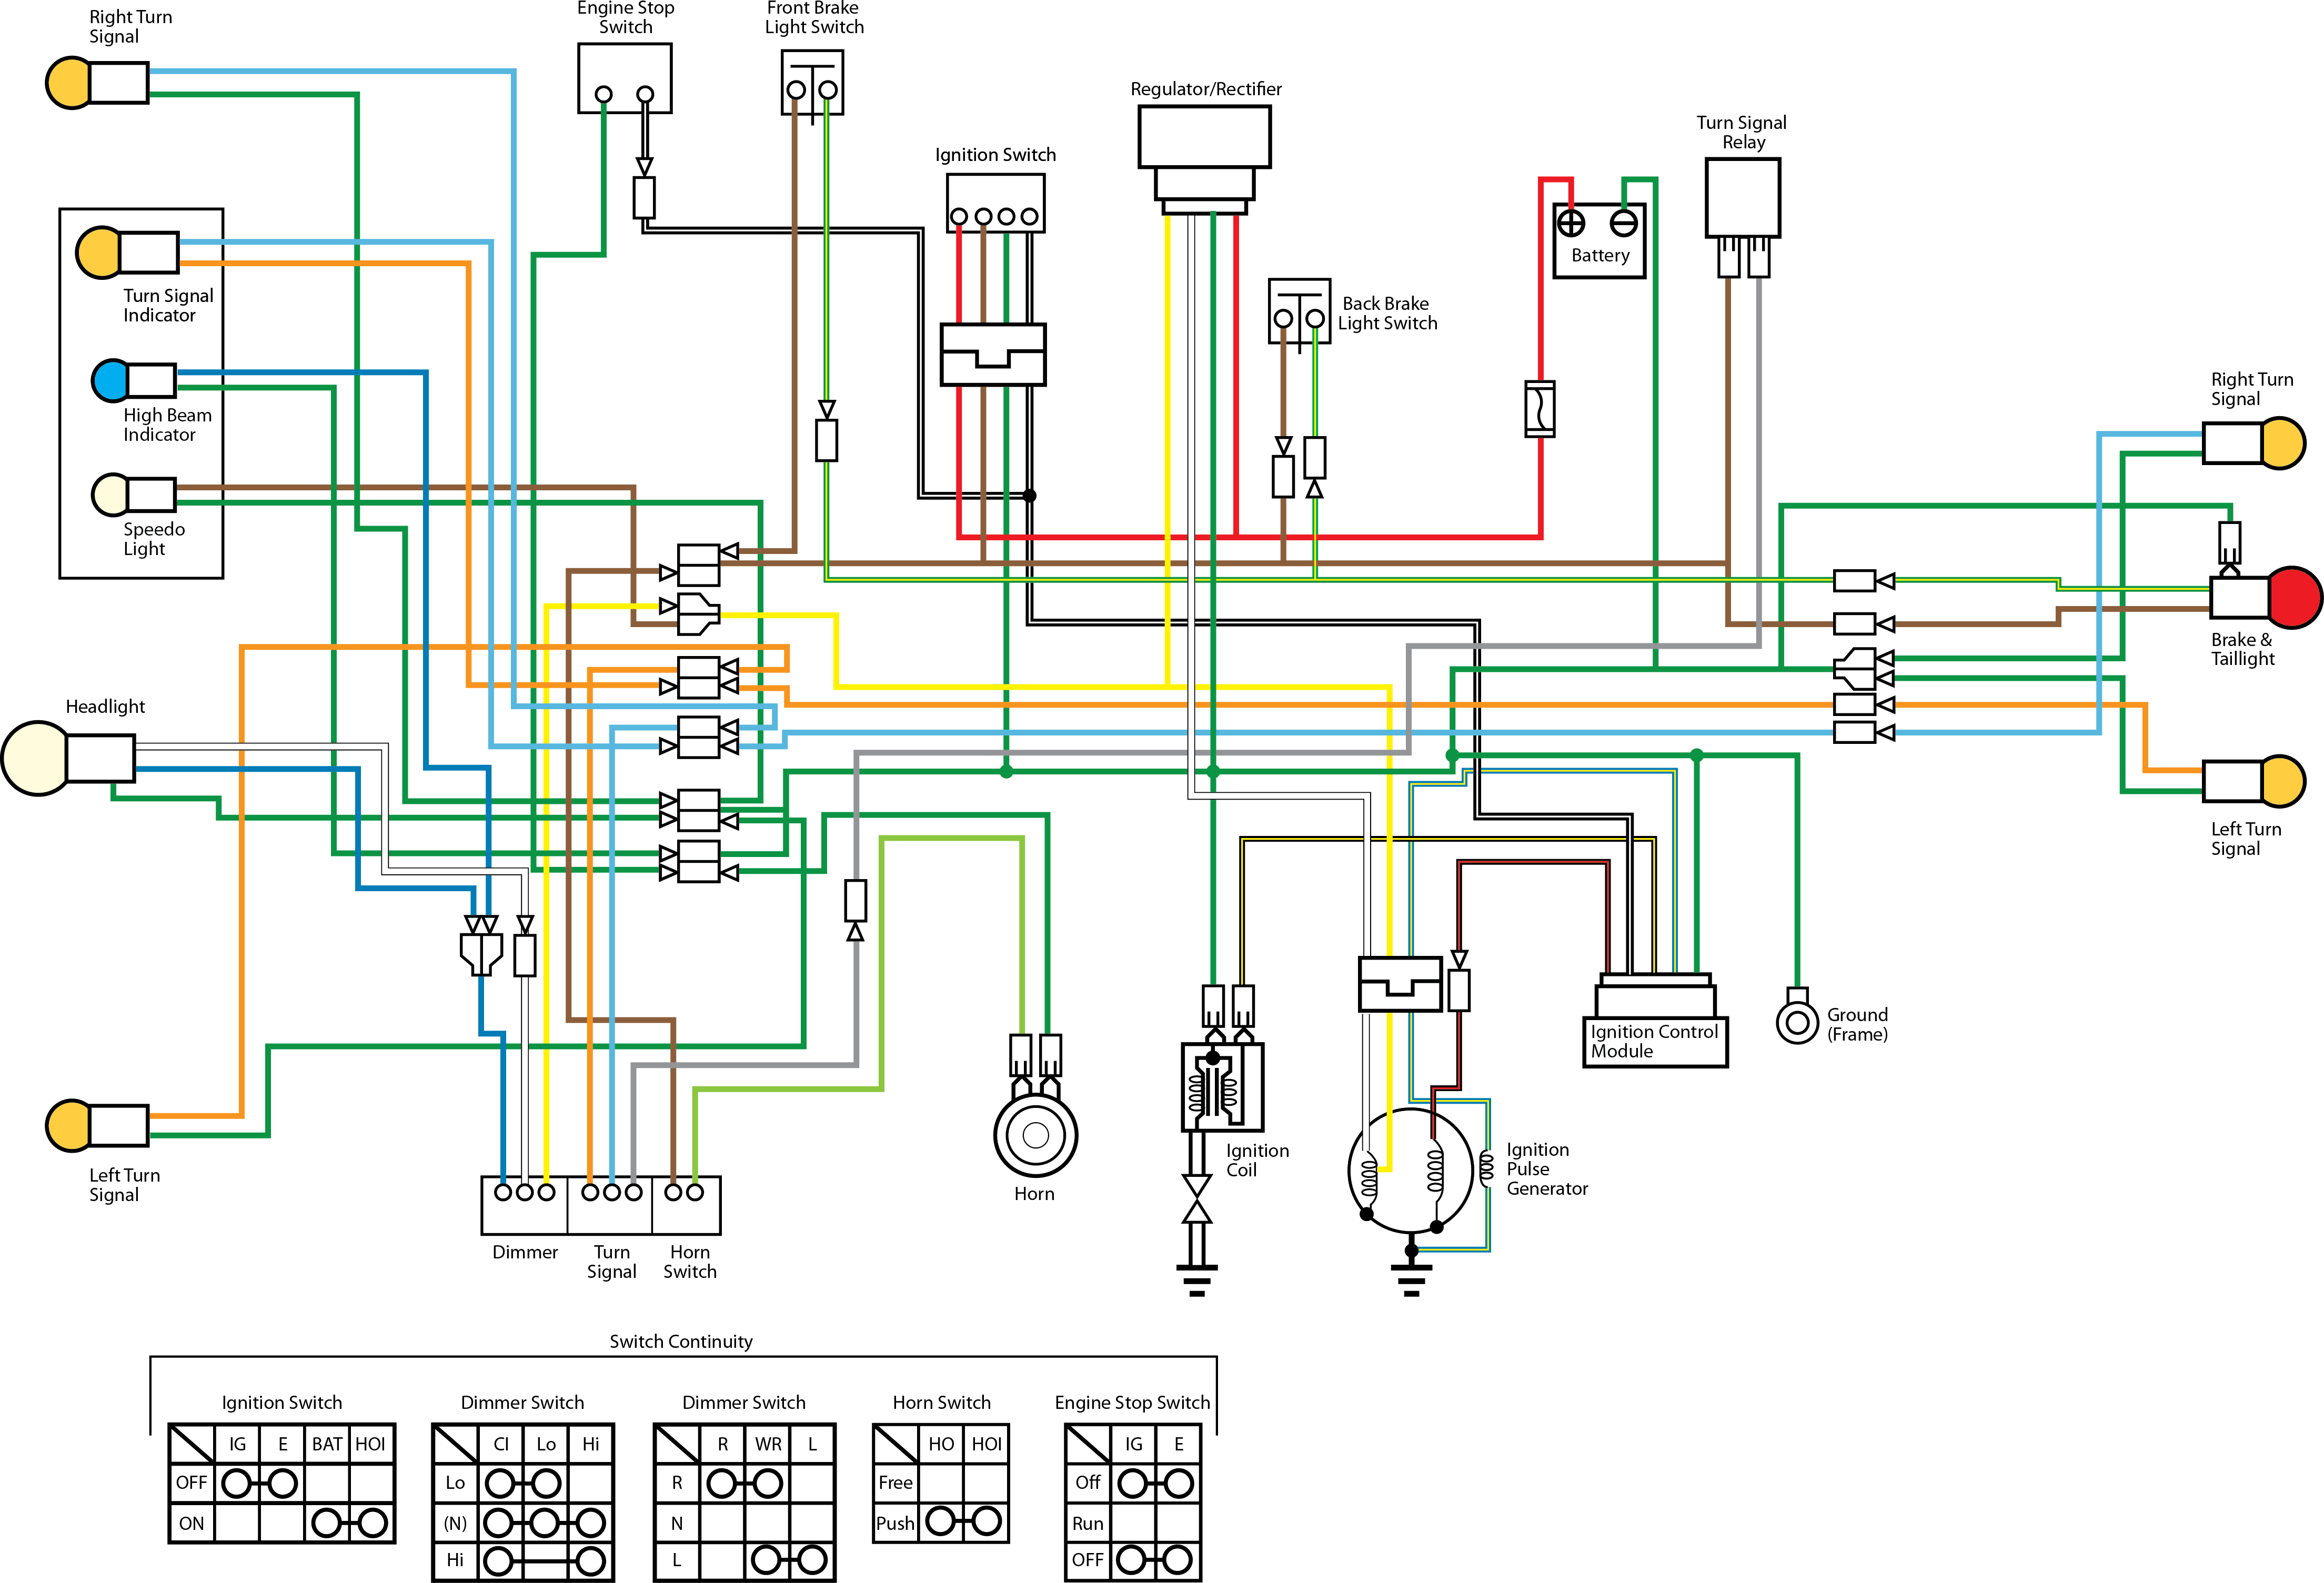 baja design stator question, Wiring diagram